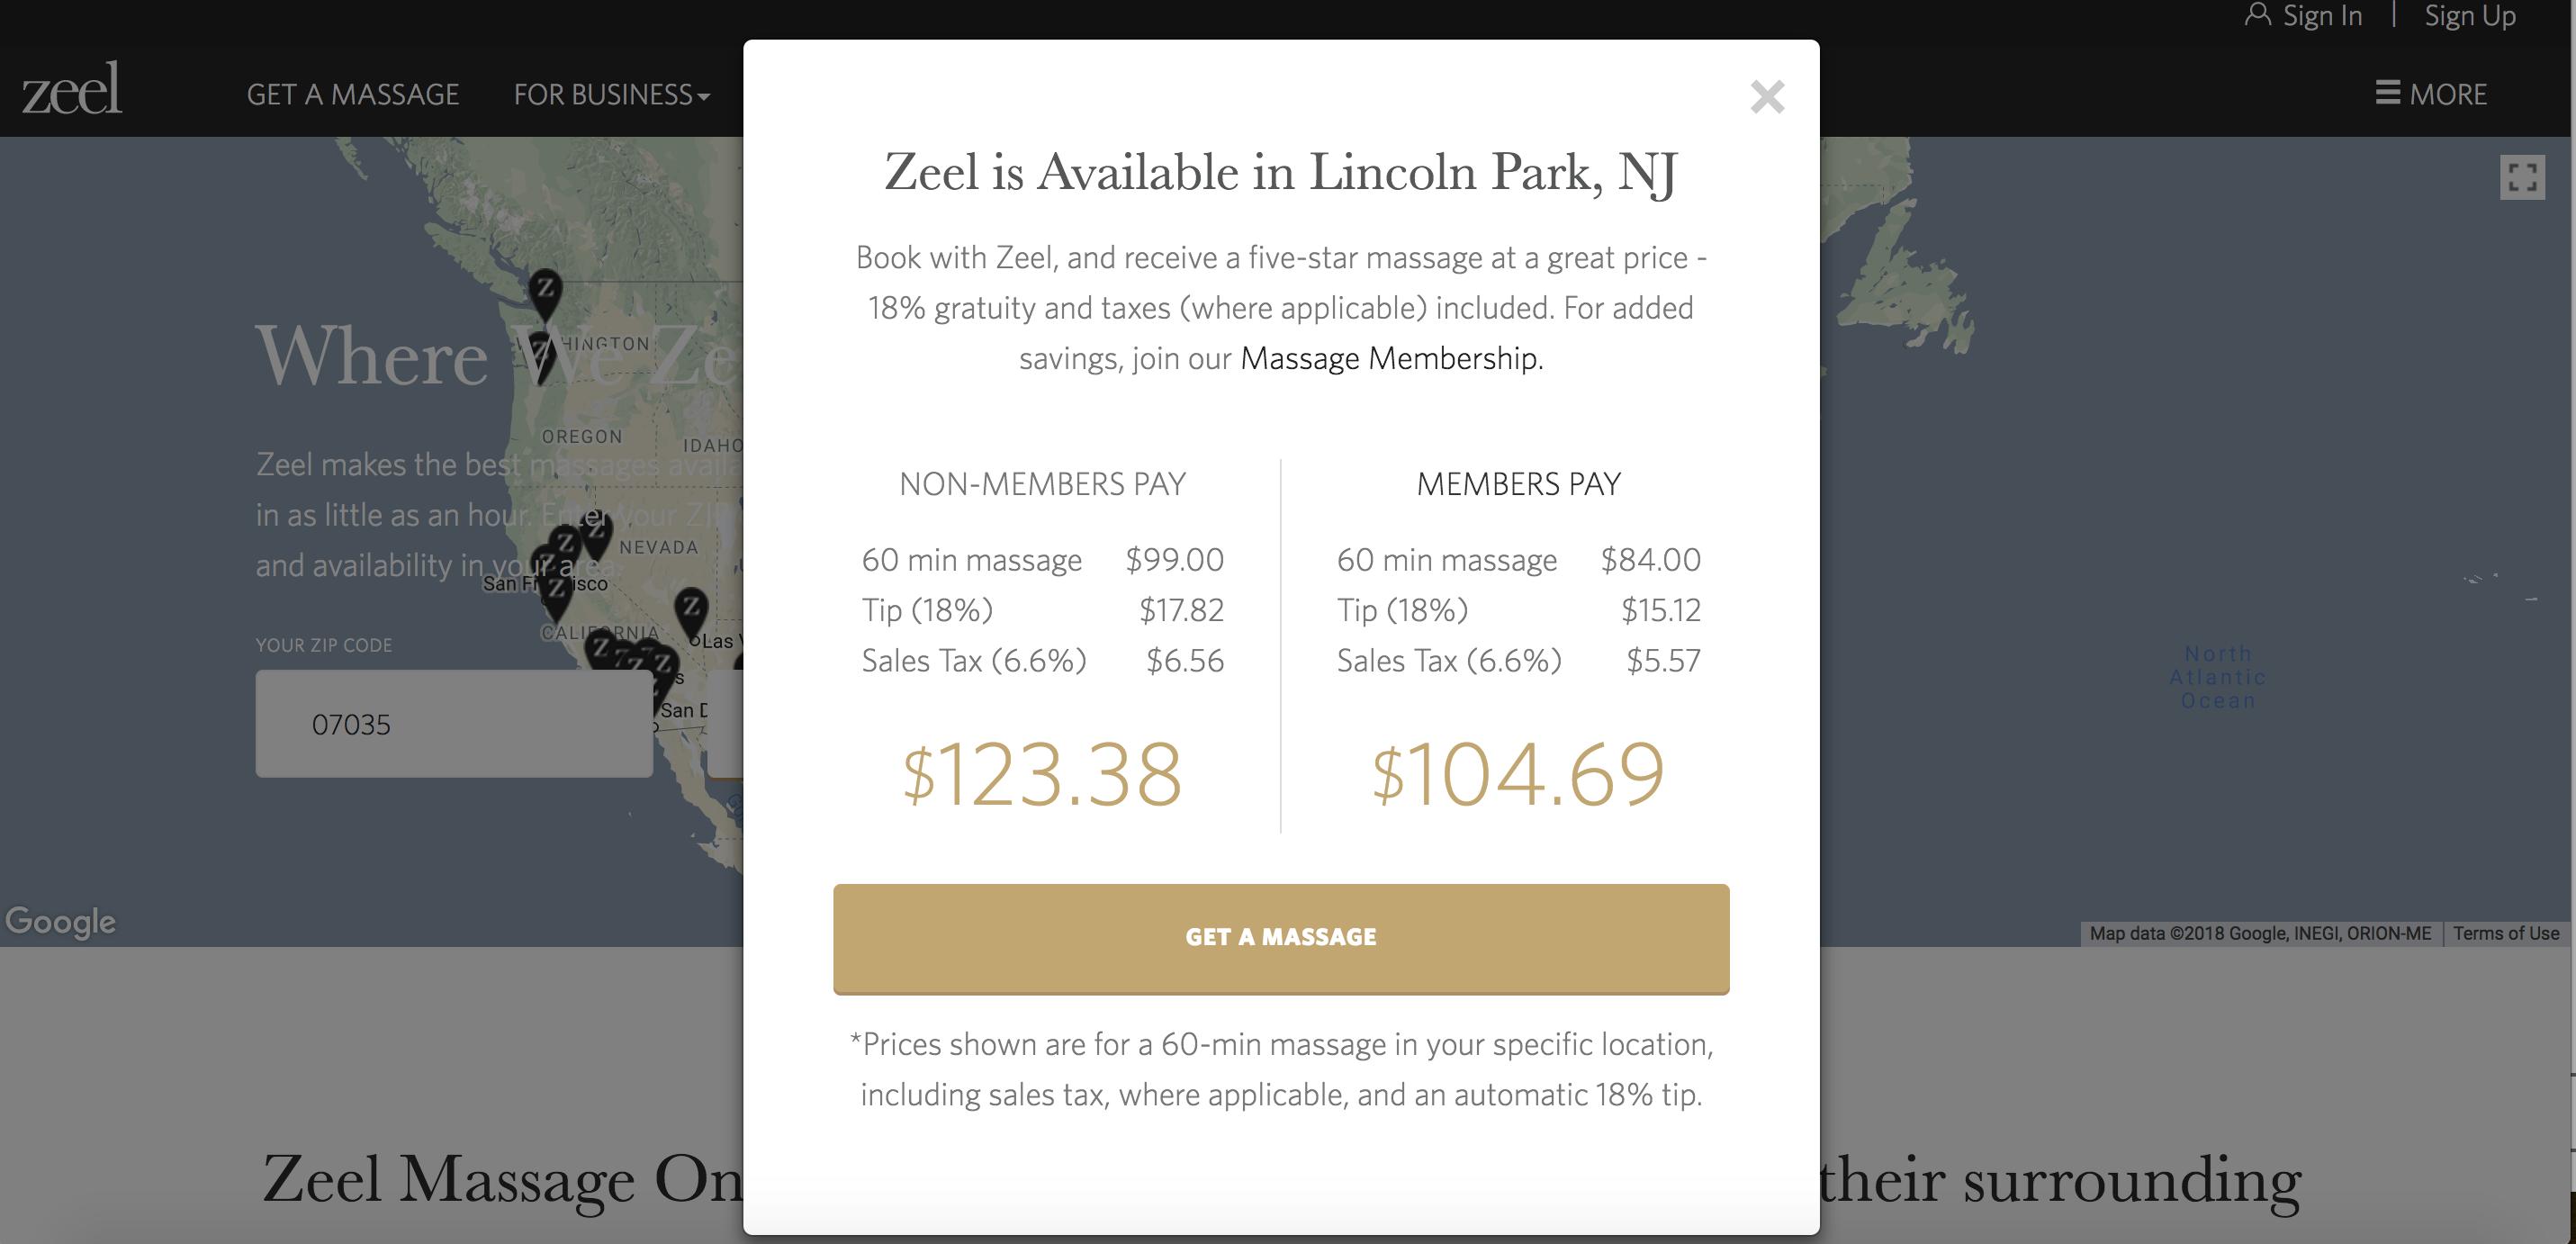 Zeel Massage membership Jersey City